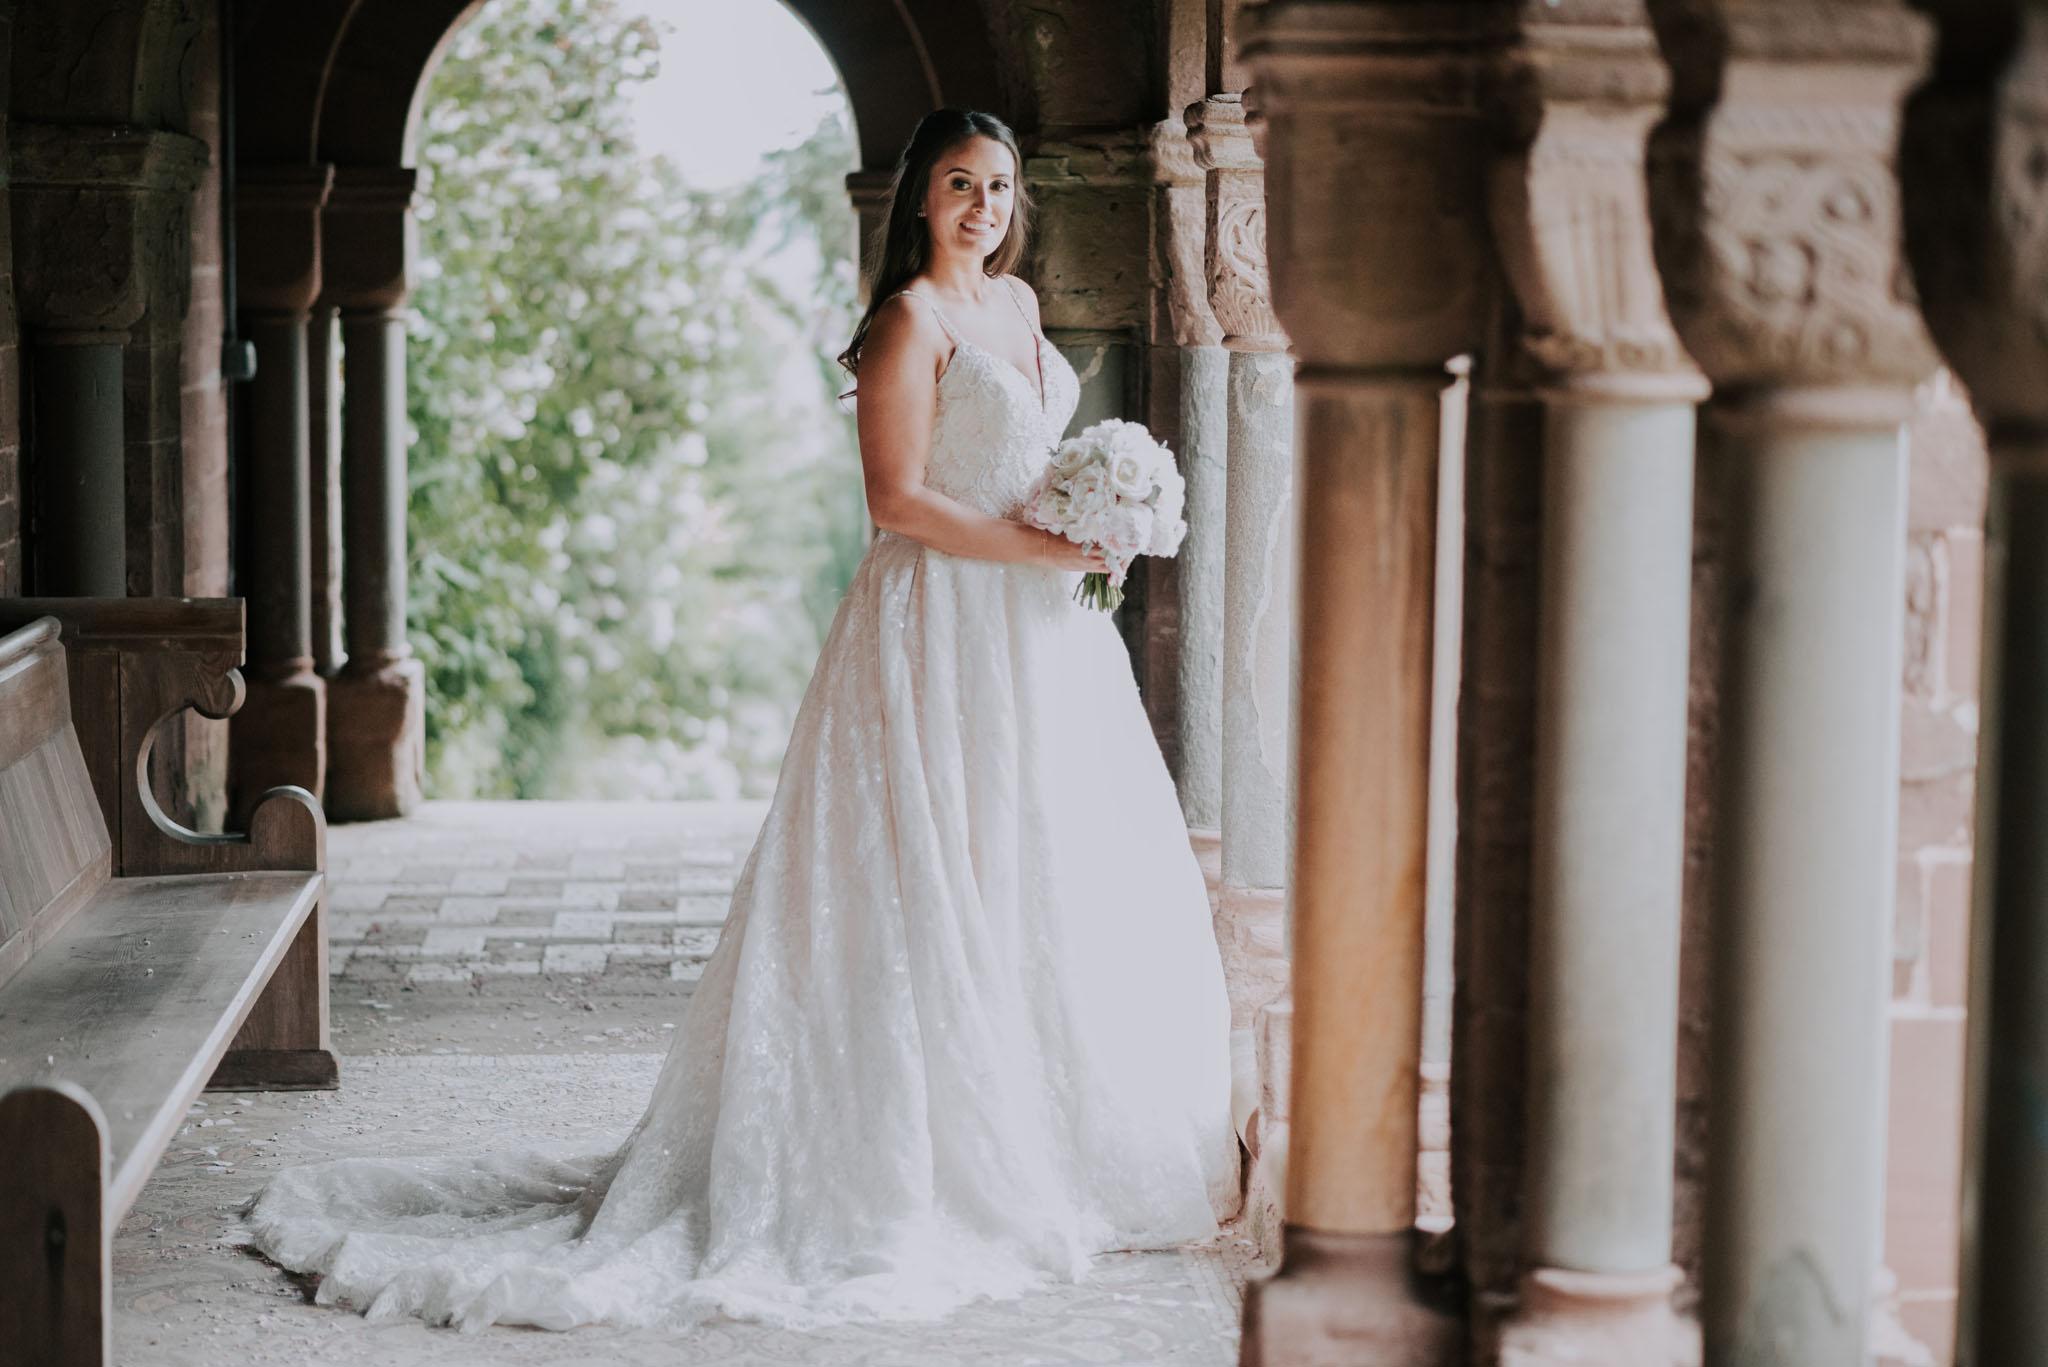 wedding-photographer-glewstone-court-hereford-scott-stockwell-photography285.jpg